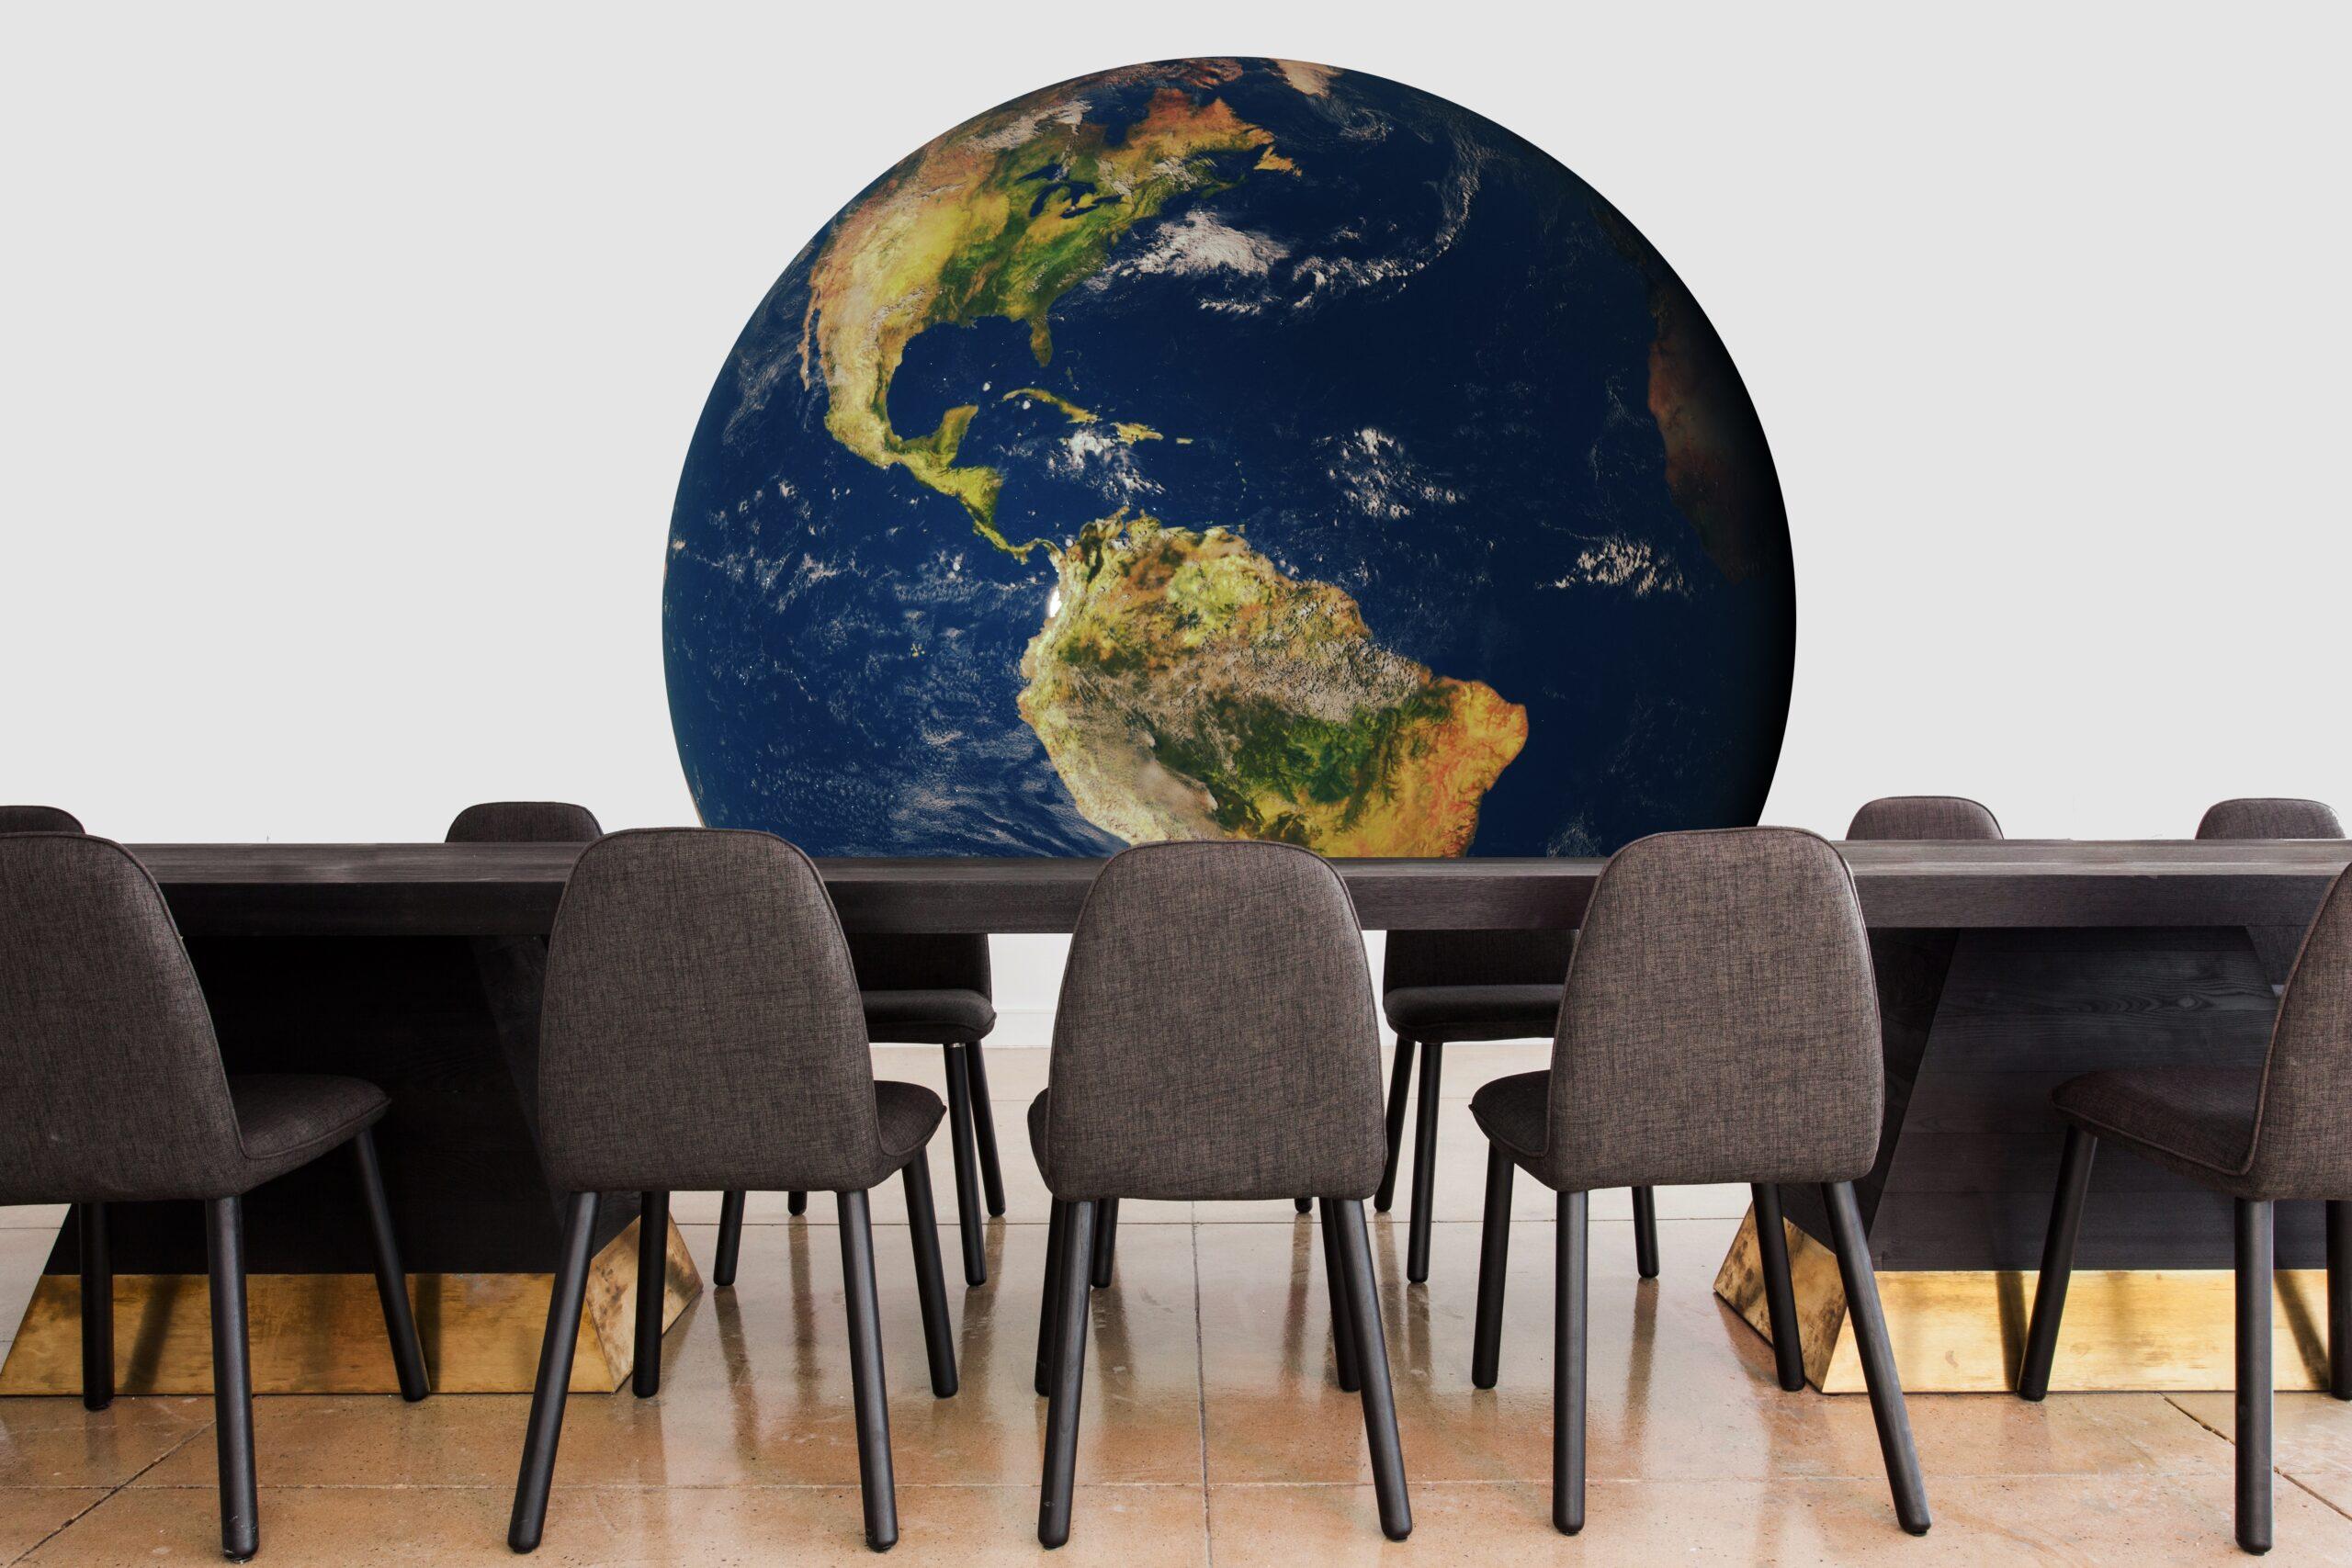 GOVERNANCE MATTERS, THE NEWSLETTER OF BOARDWISE: THE GLOBAL GOVERNANCE COMMUNITY